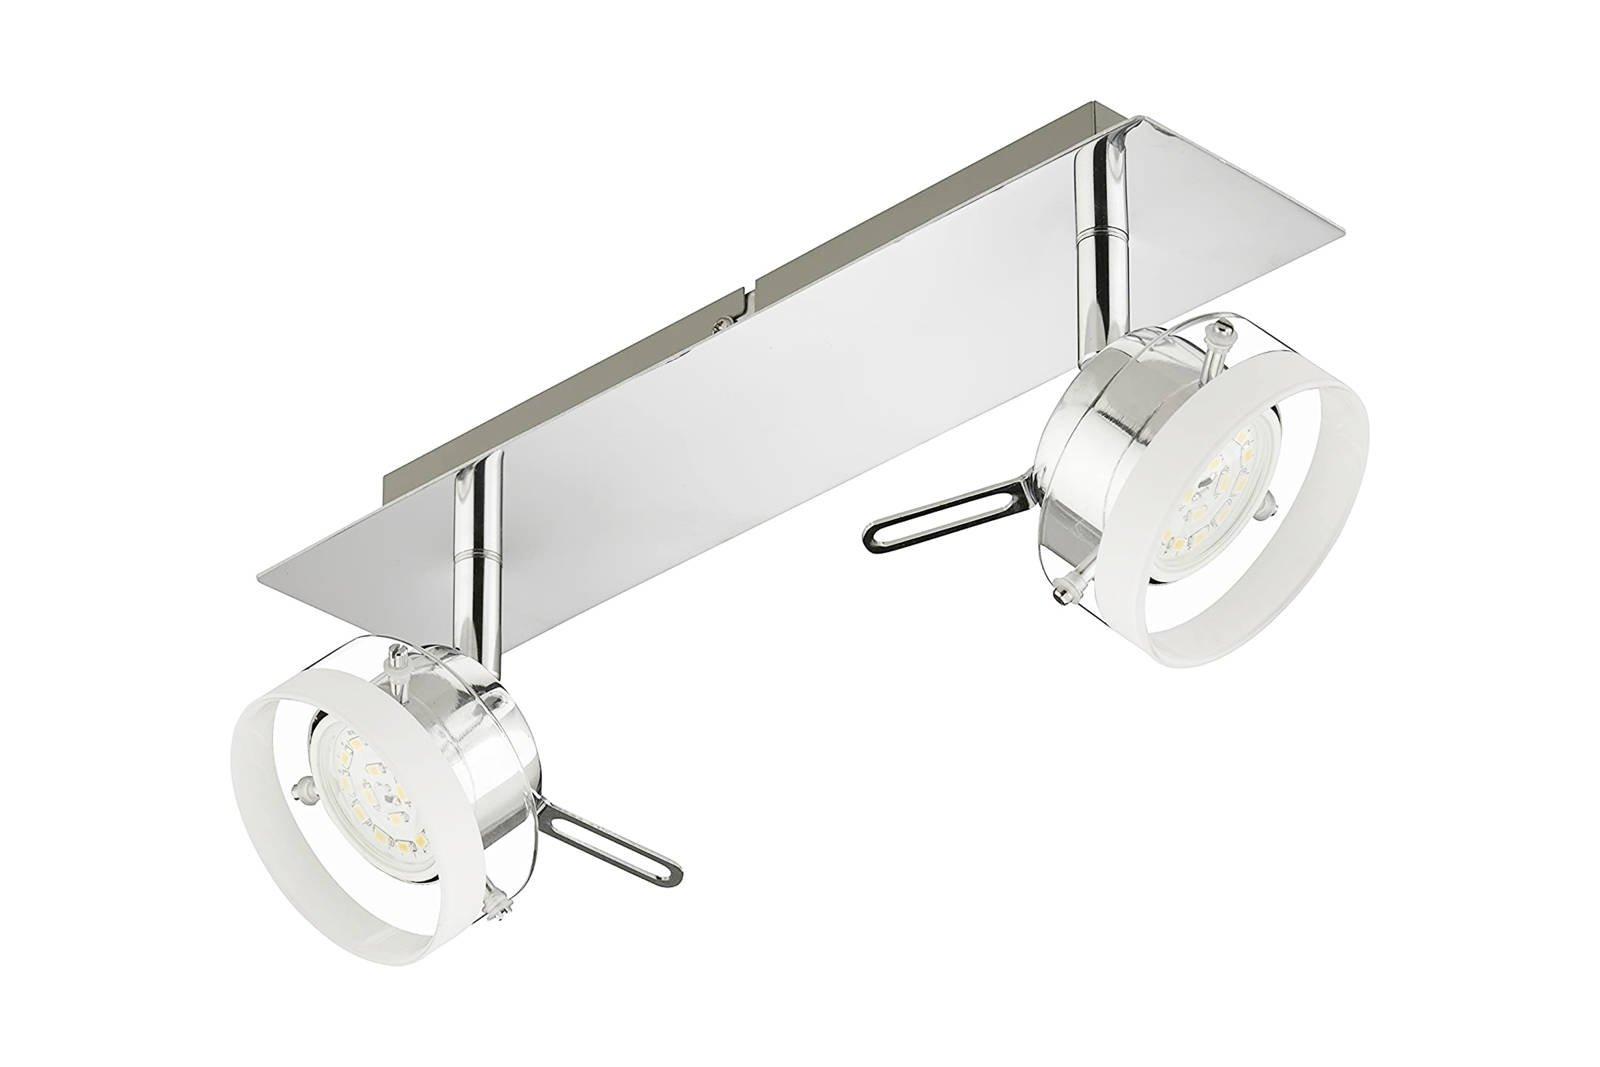 Ceiling Lamp Ceiling Briloner Click 2807-028 2x 5W LED